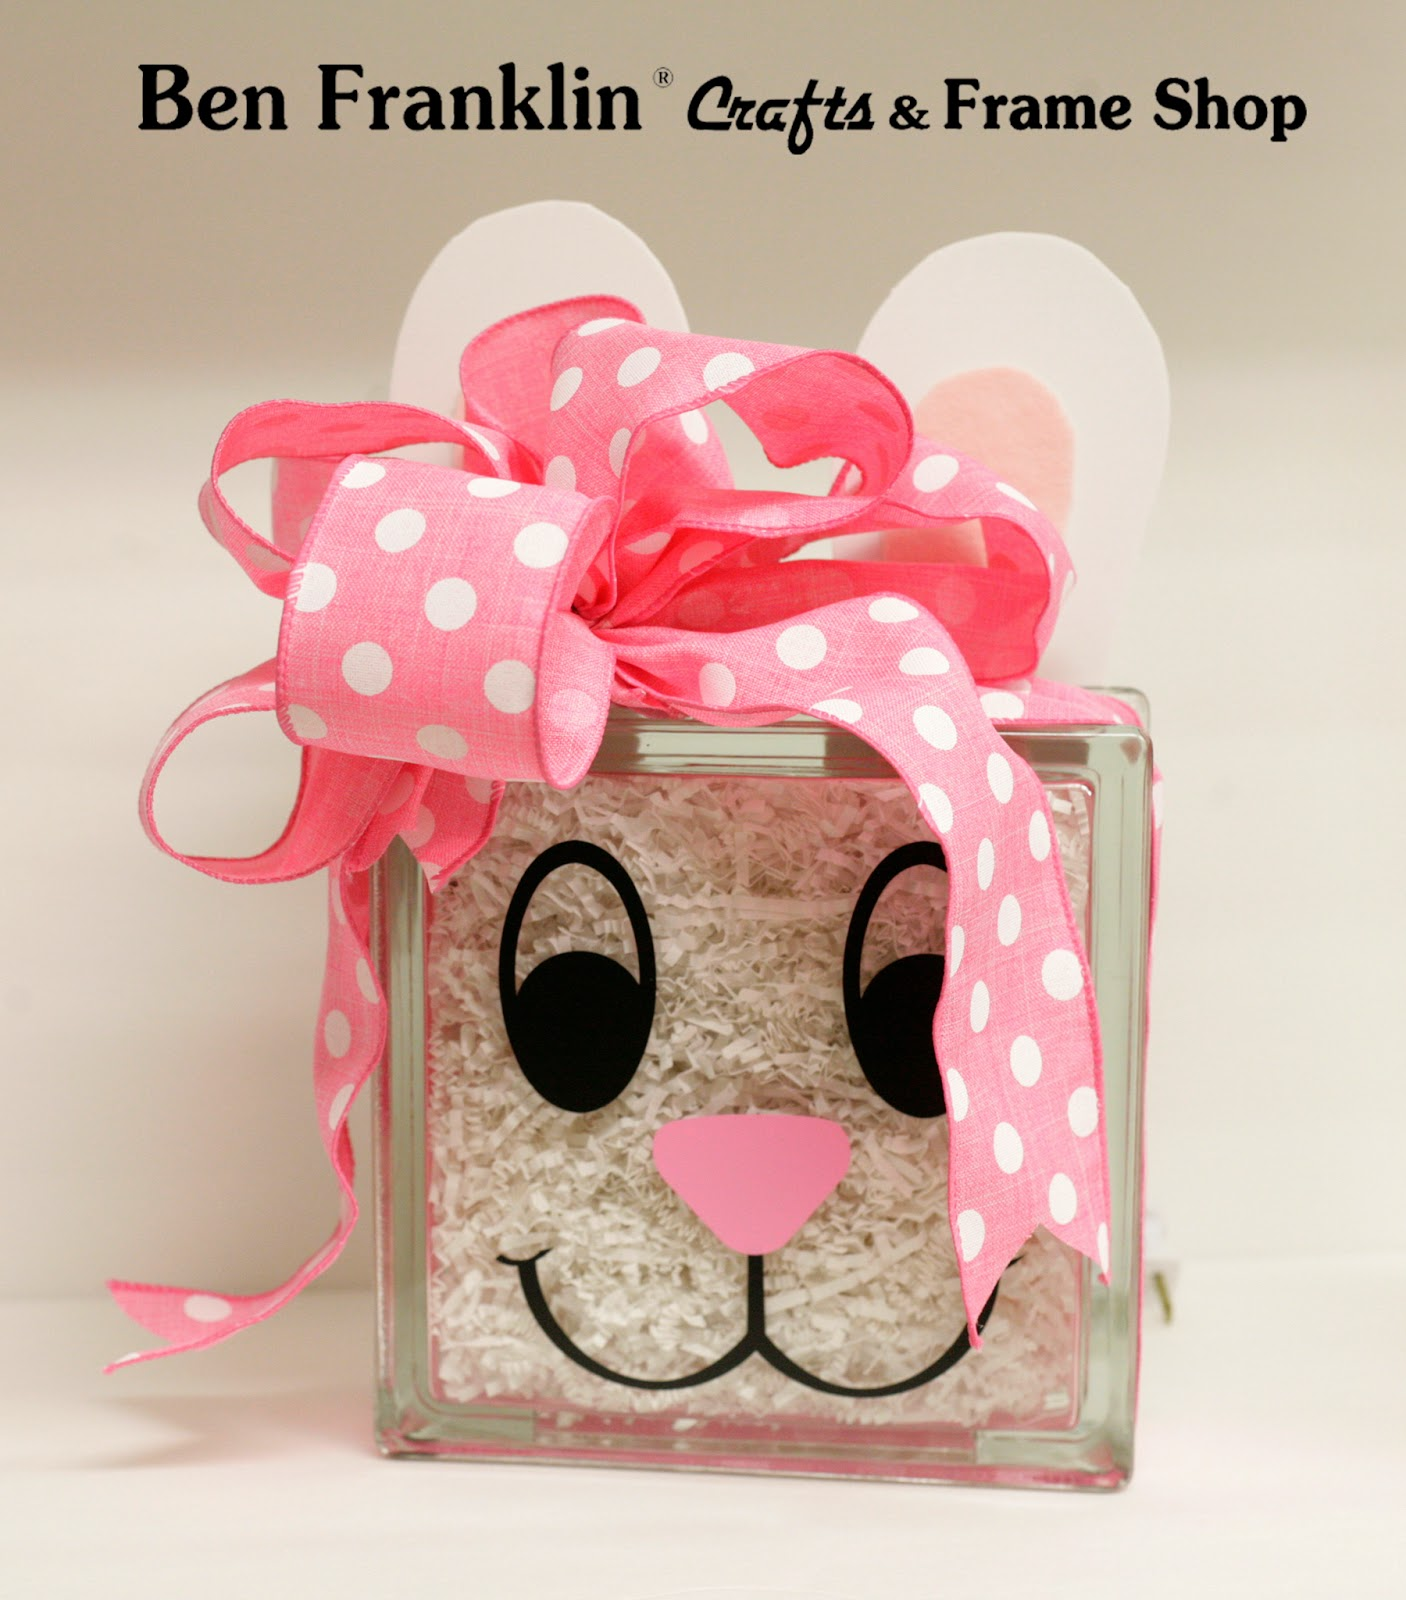 Ben Franklin Crafts and Frame Shop: Glass Block Bunny